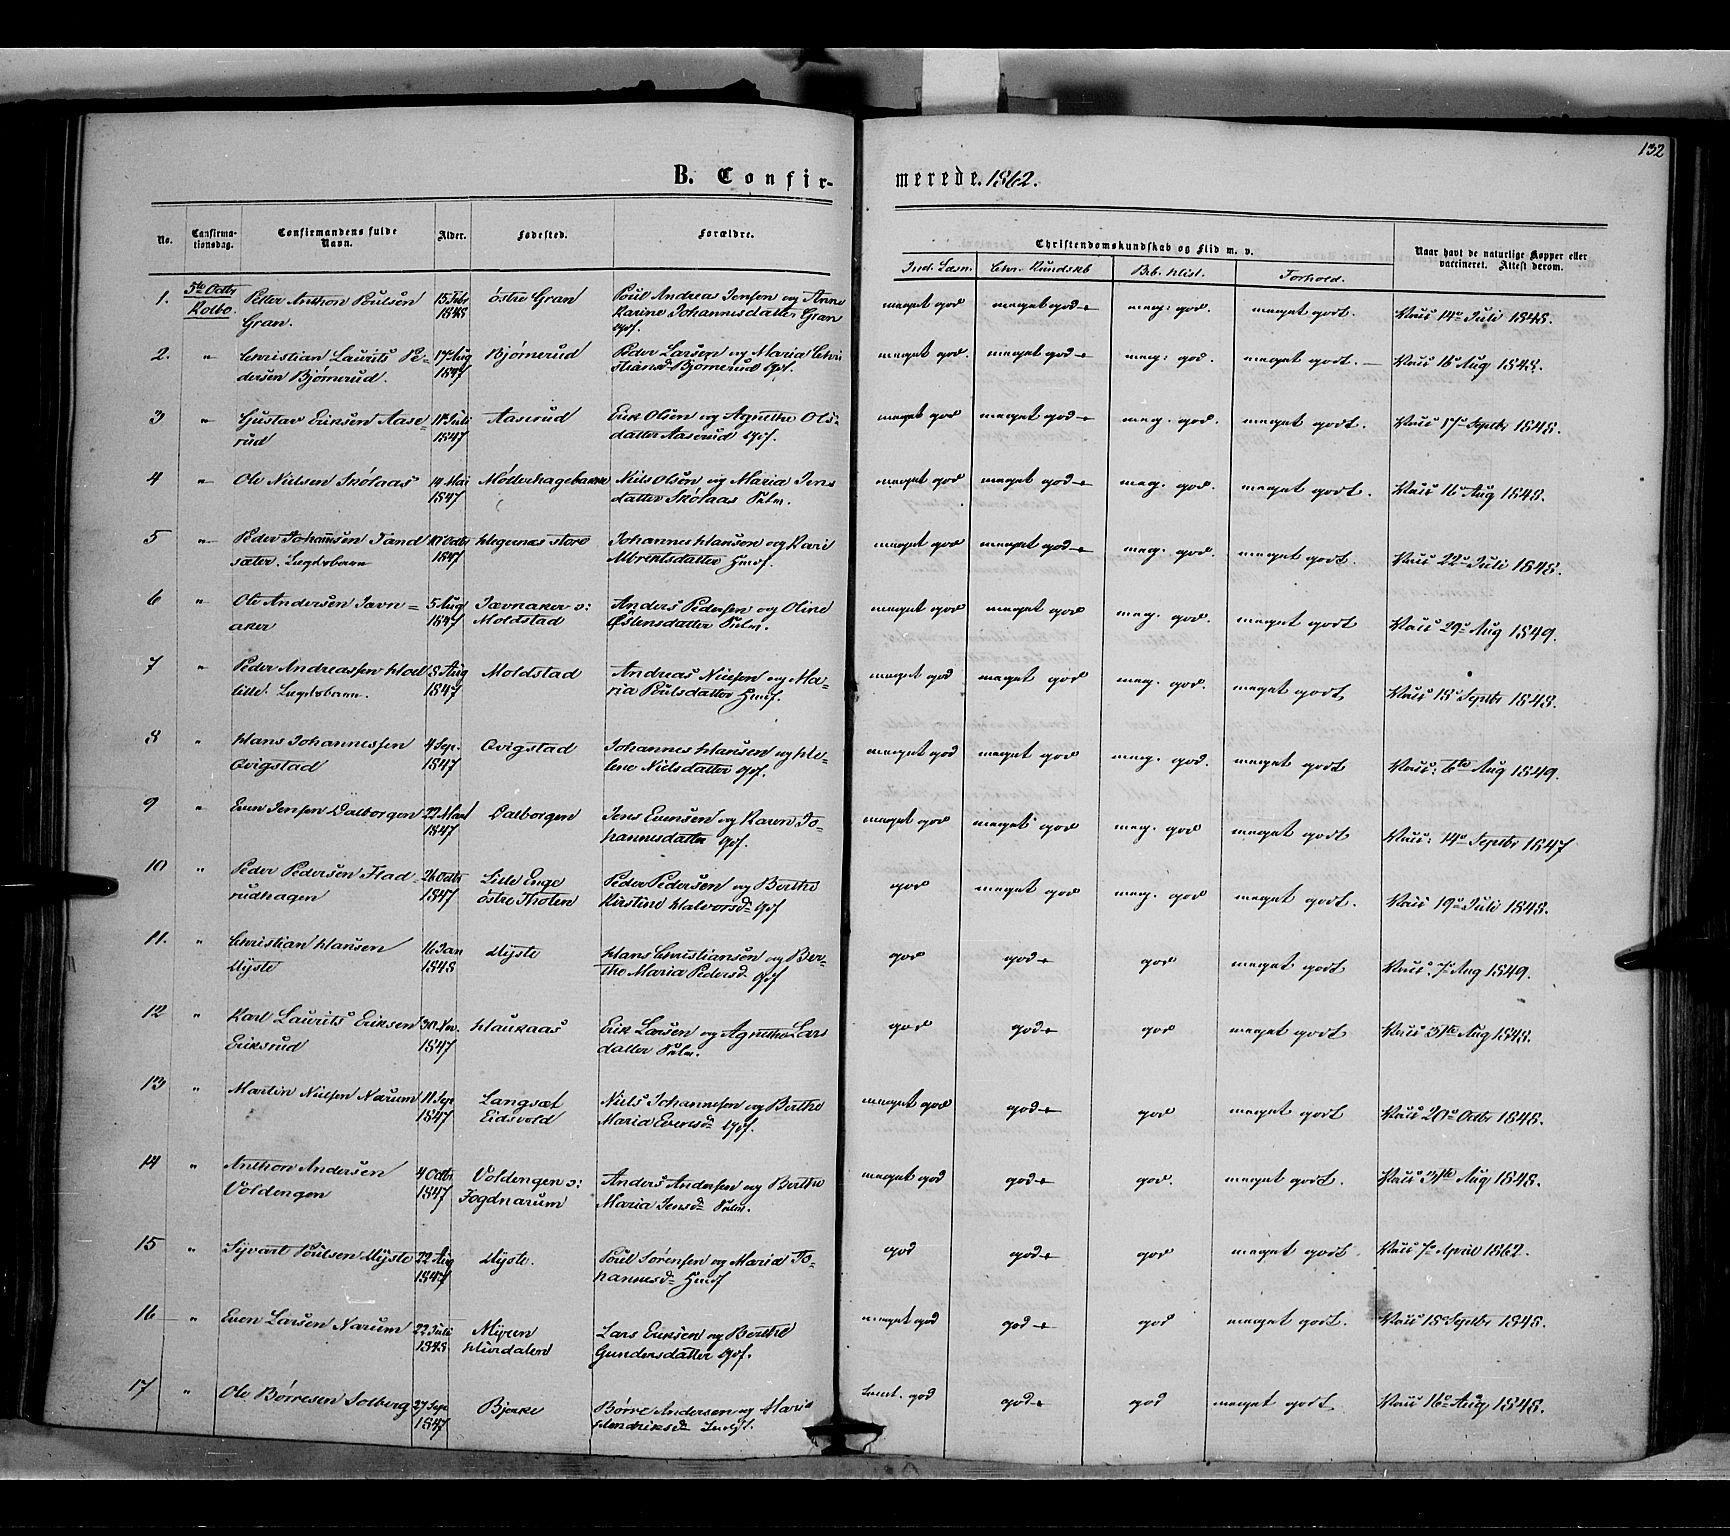 SAH, Vestre Toten prestekontor, H/Ha/Haa/L0007: Ministerialbok nr. 7, 1862-1869, s. 132